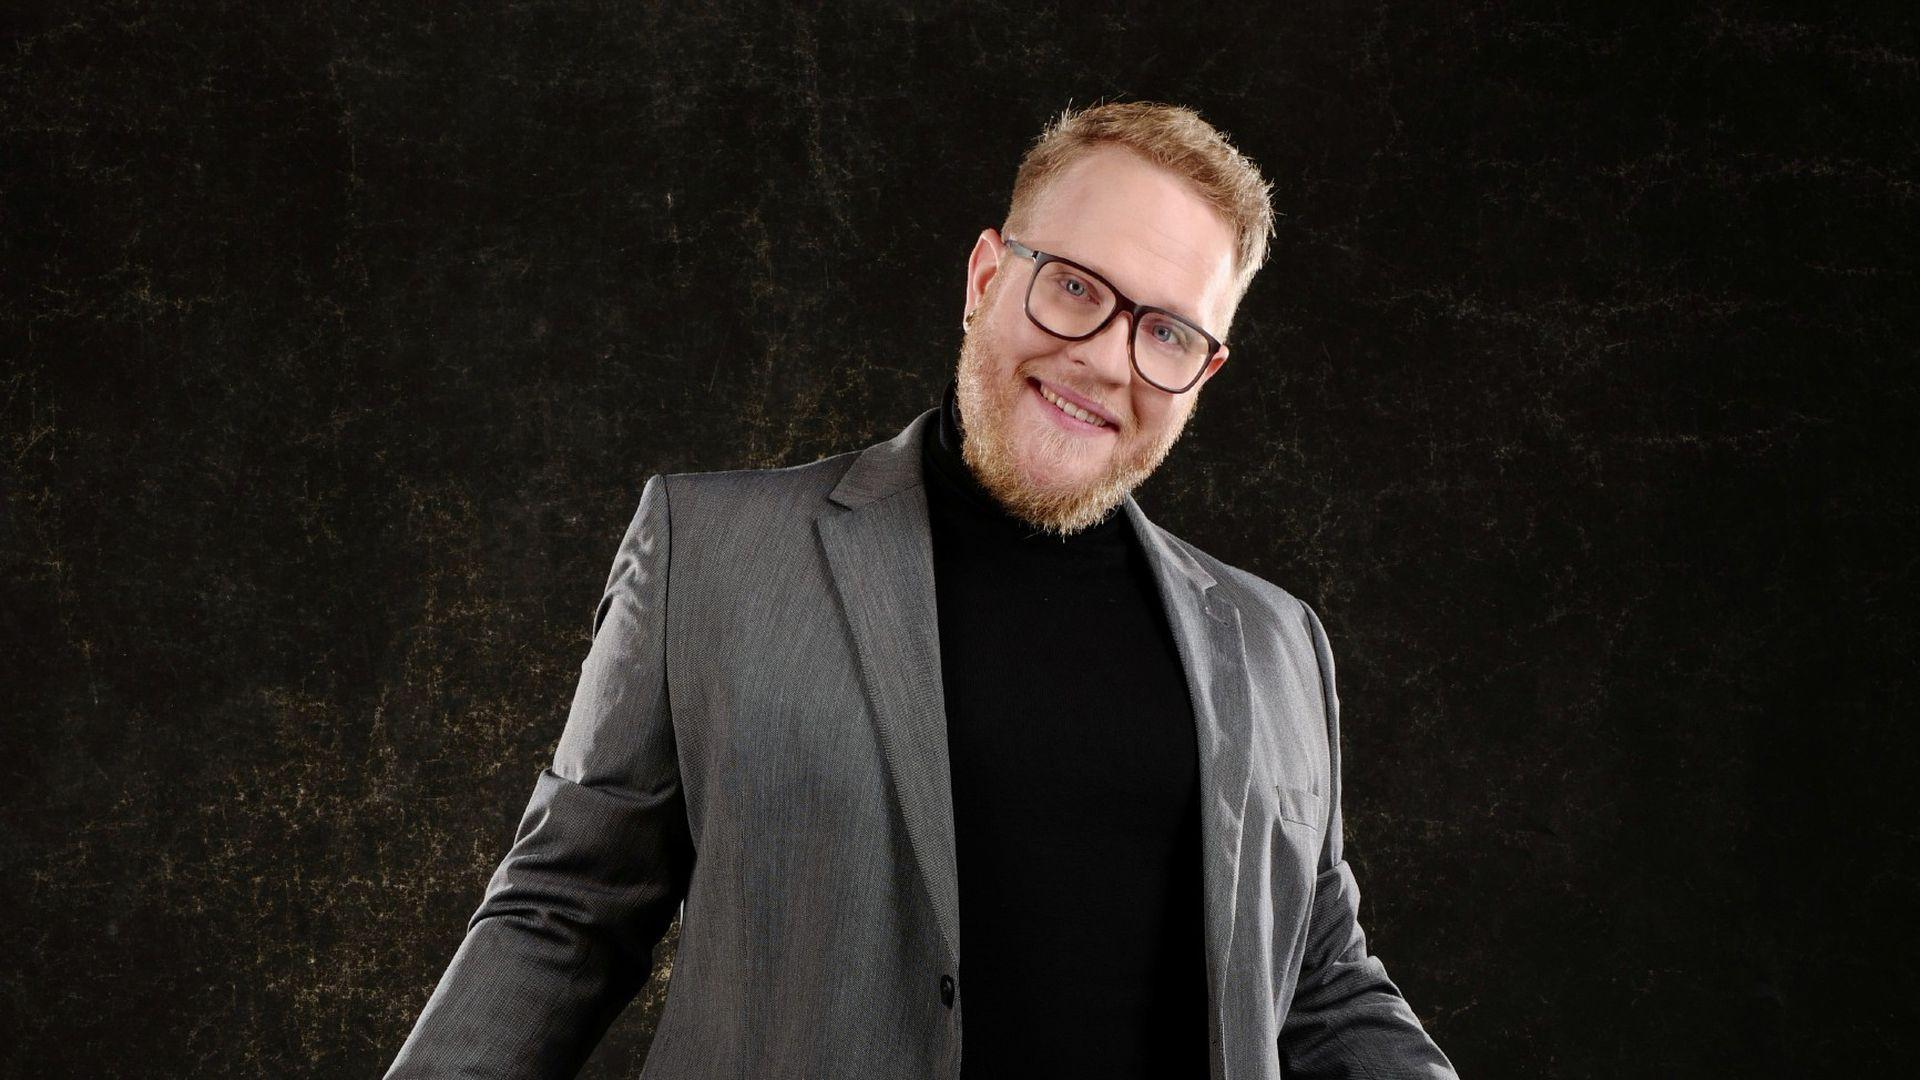 Jan Marten